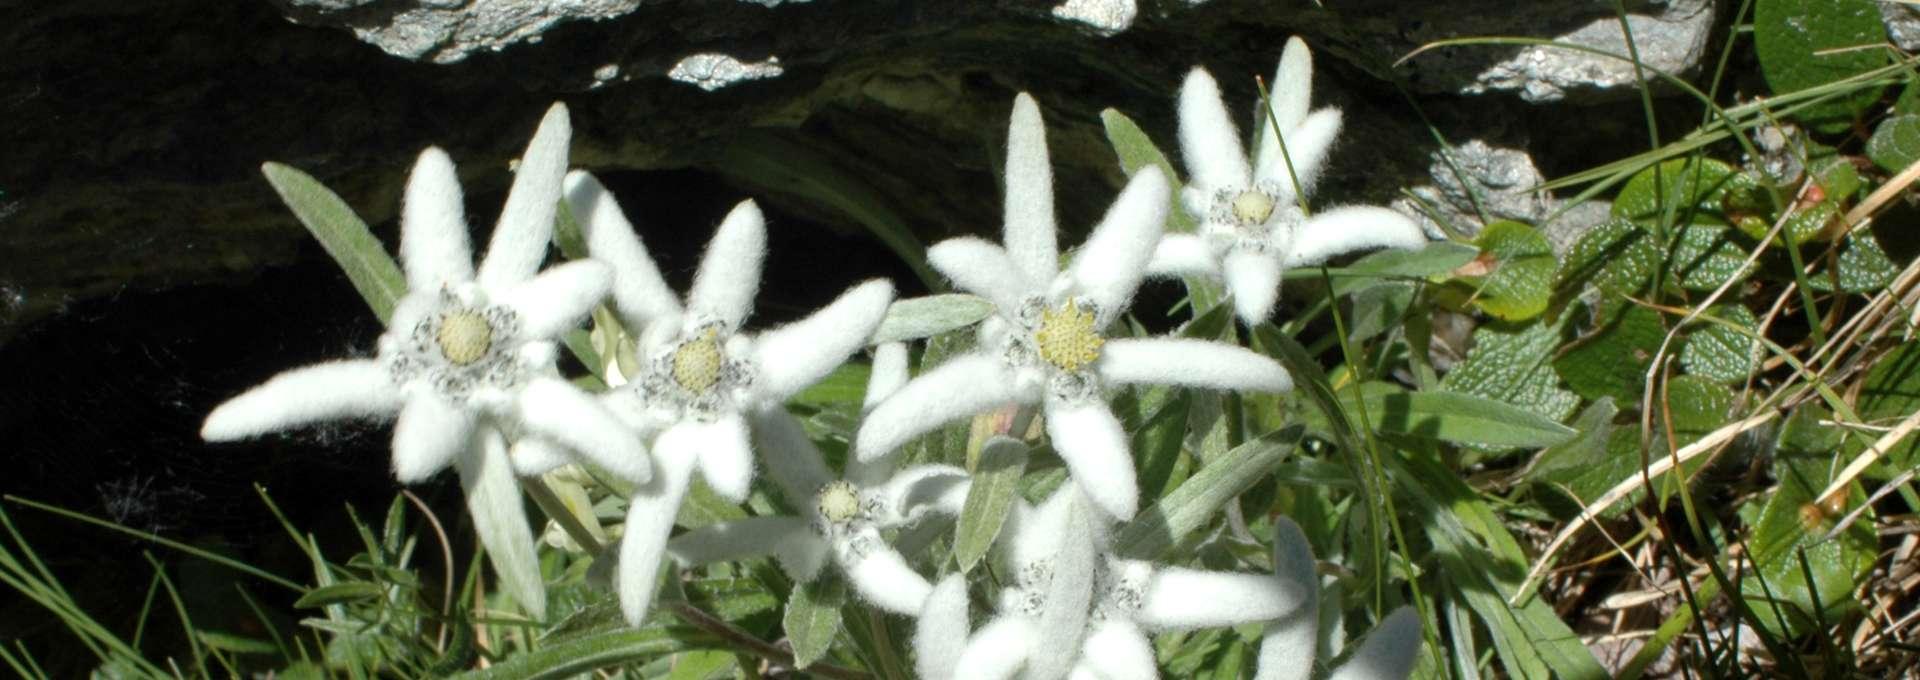 edelweiss-peisey-vallandry-658